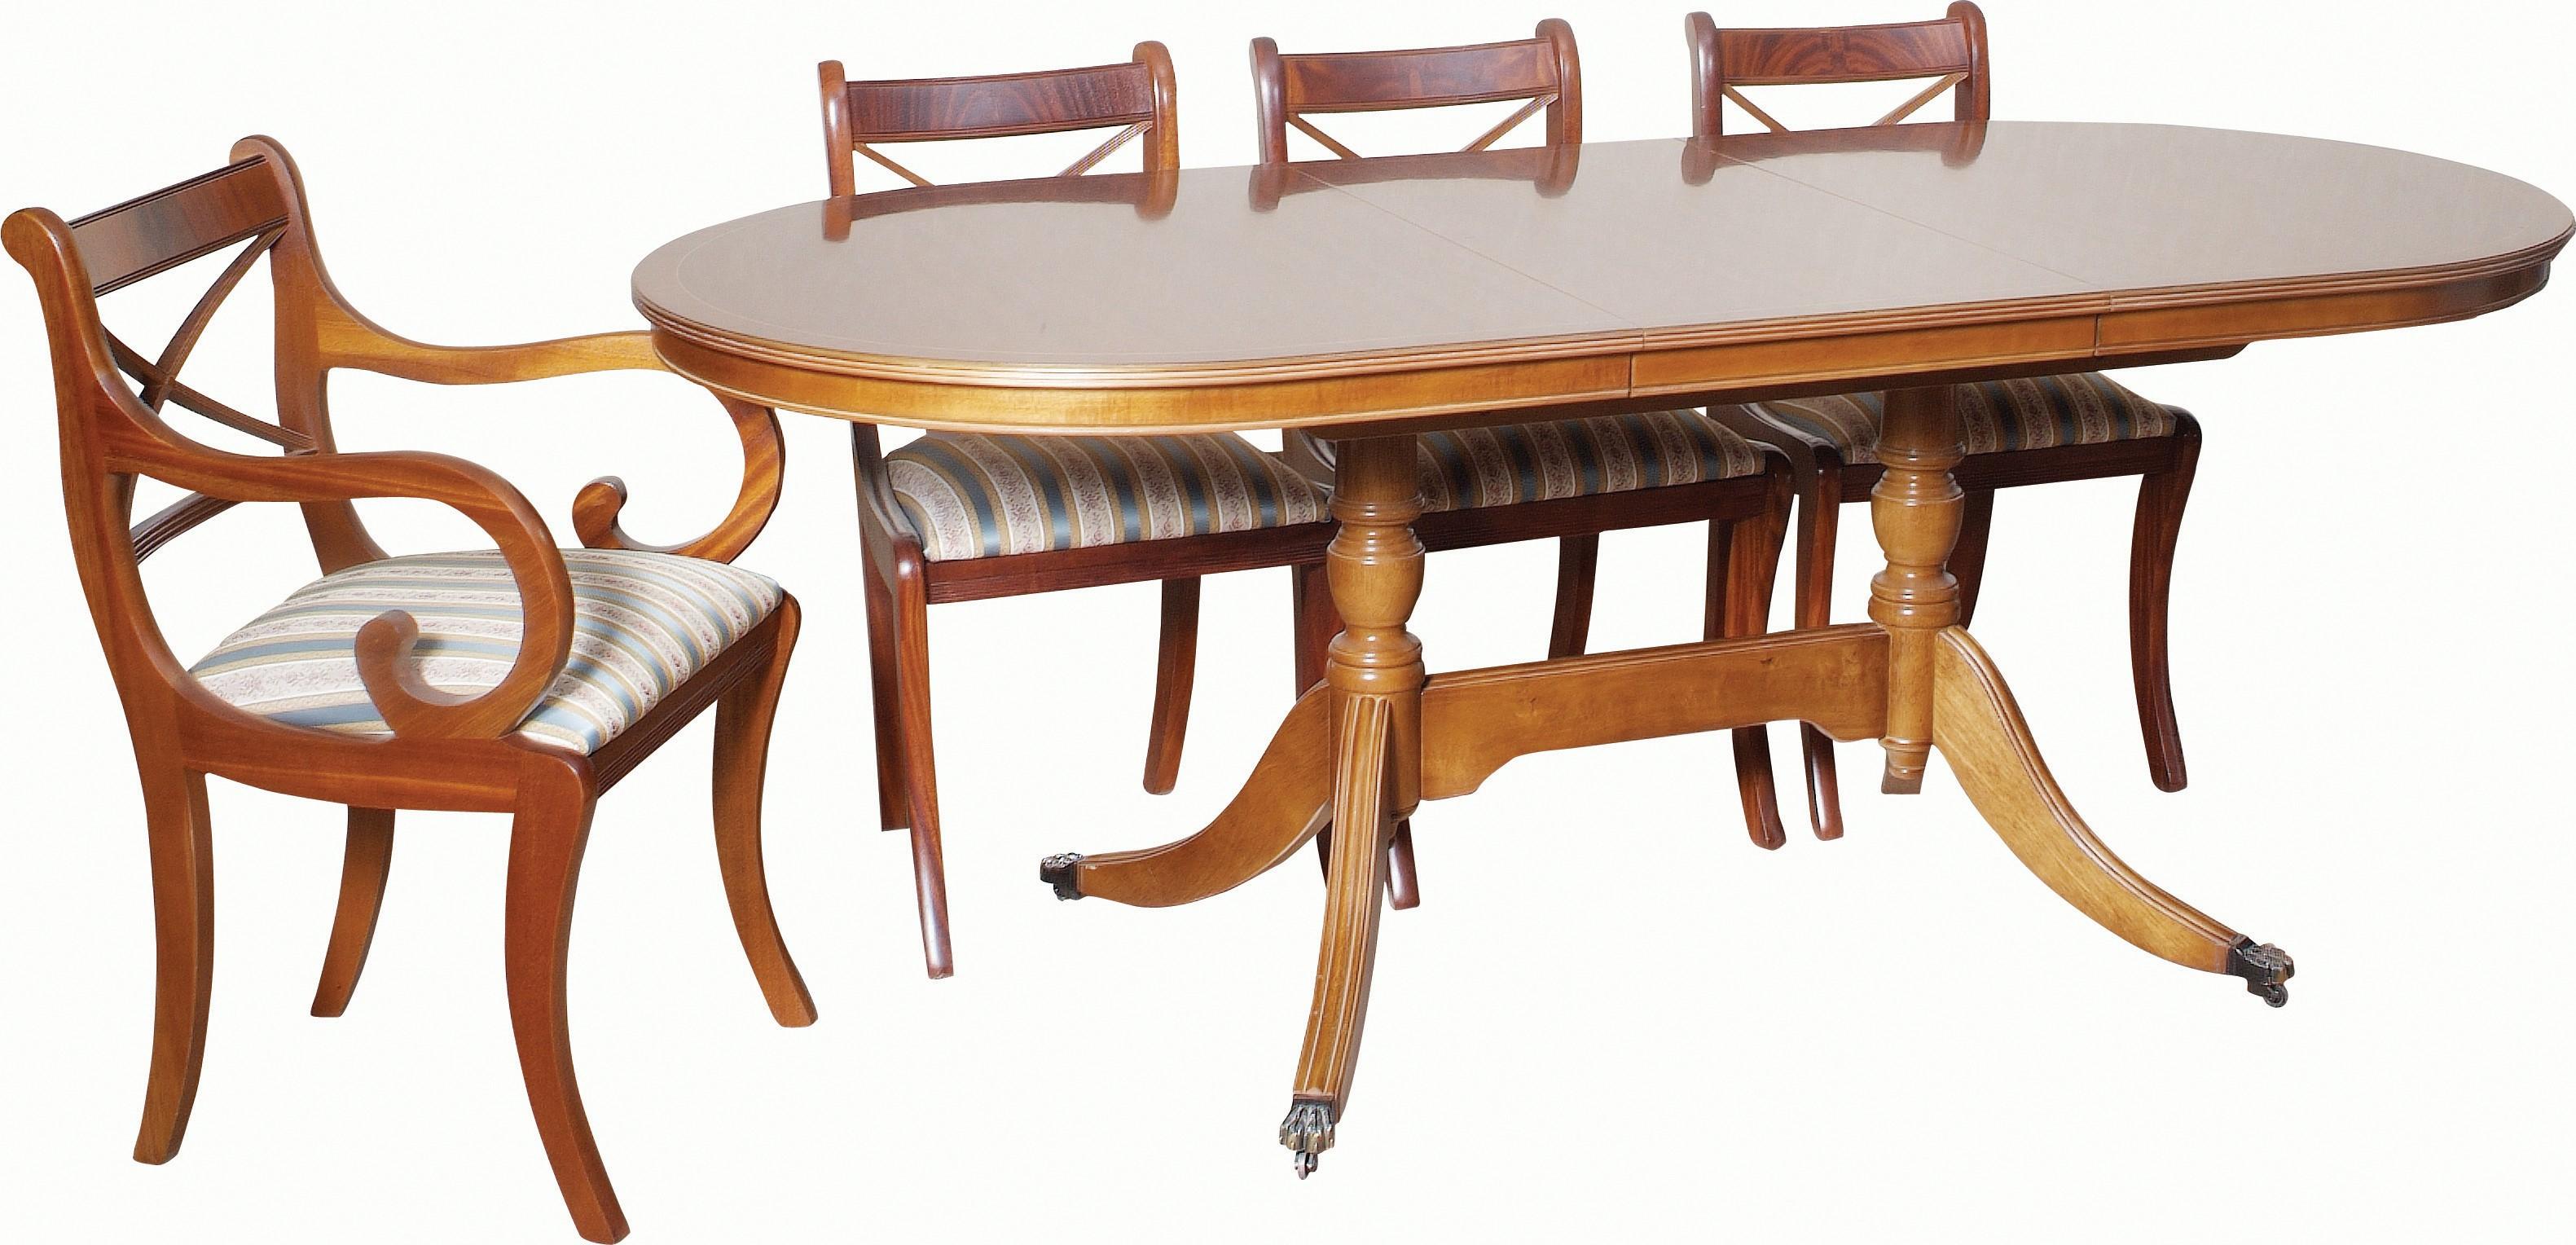 6 Stowaway Table